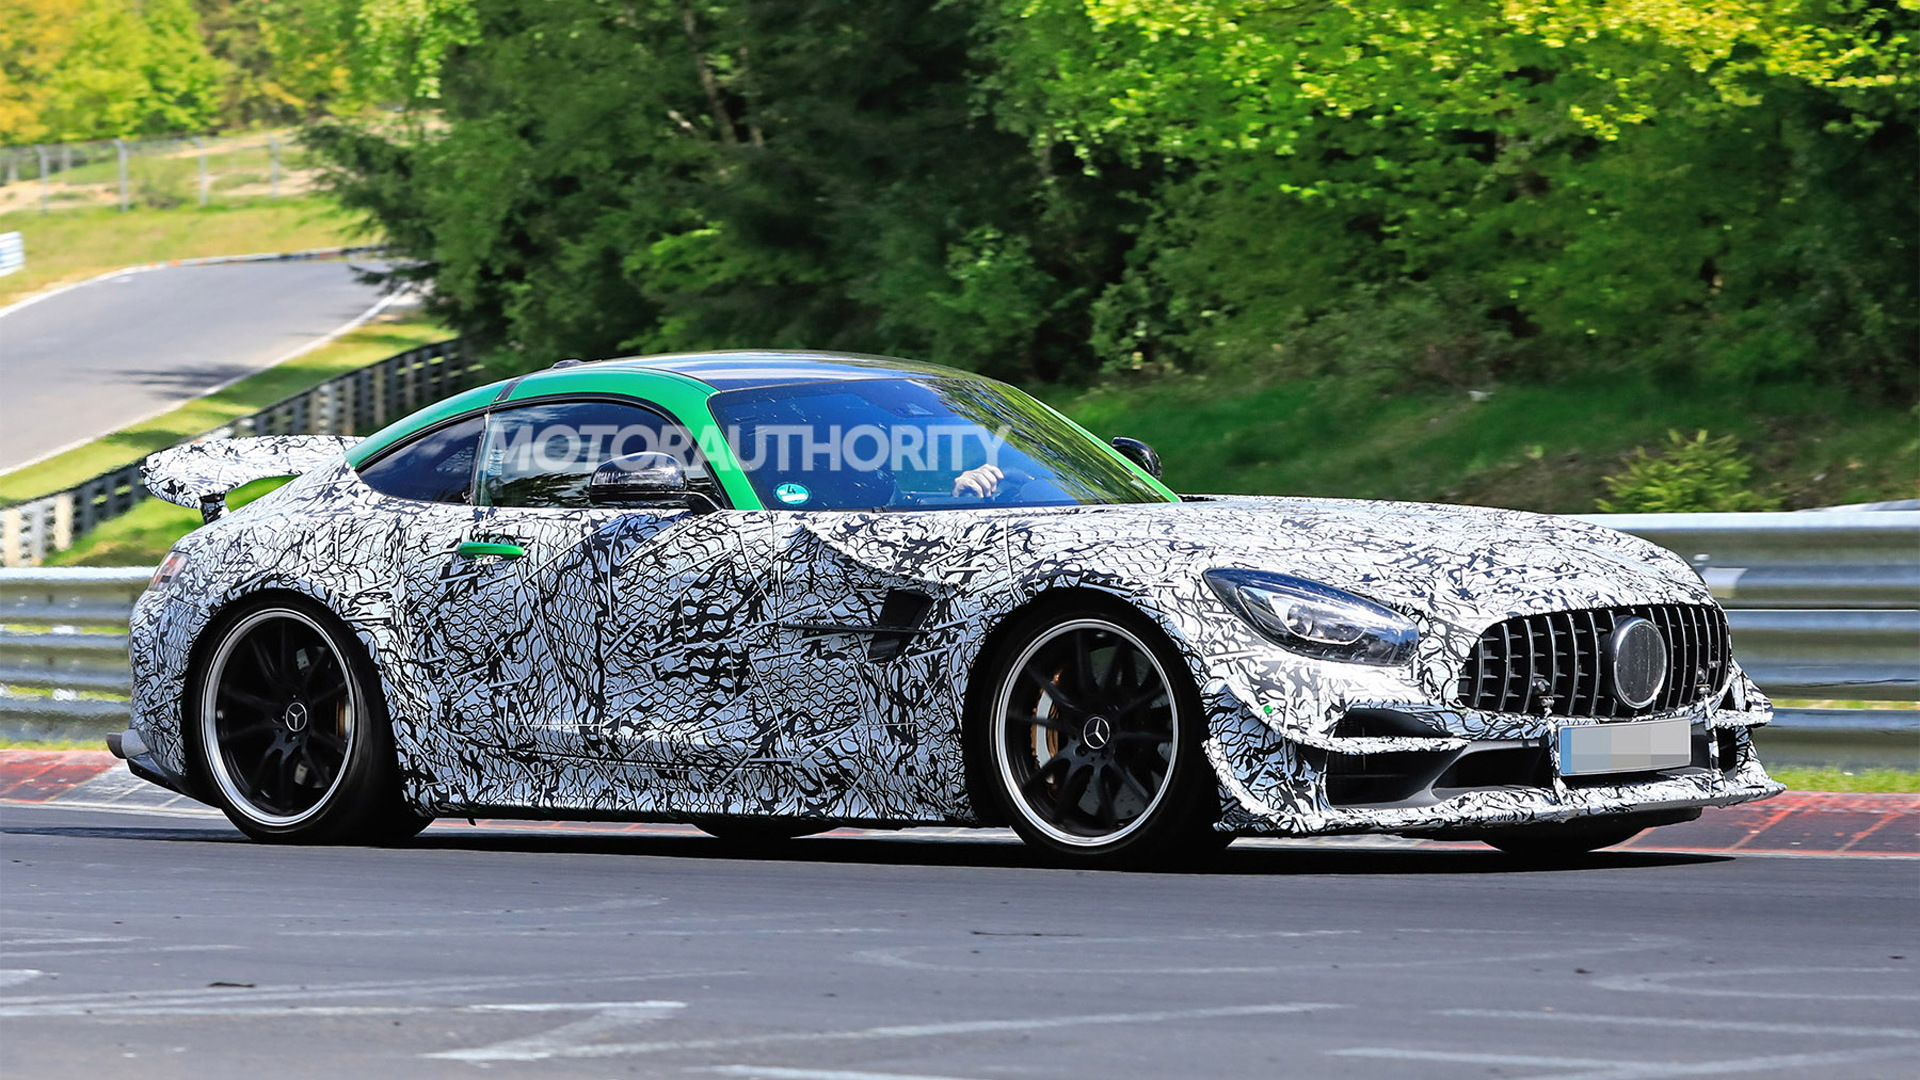 2021 Mercedes-AMG GT R Evo spy shots - Image via S. Baldauf/SB-Medien